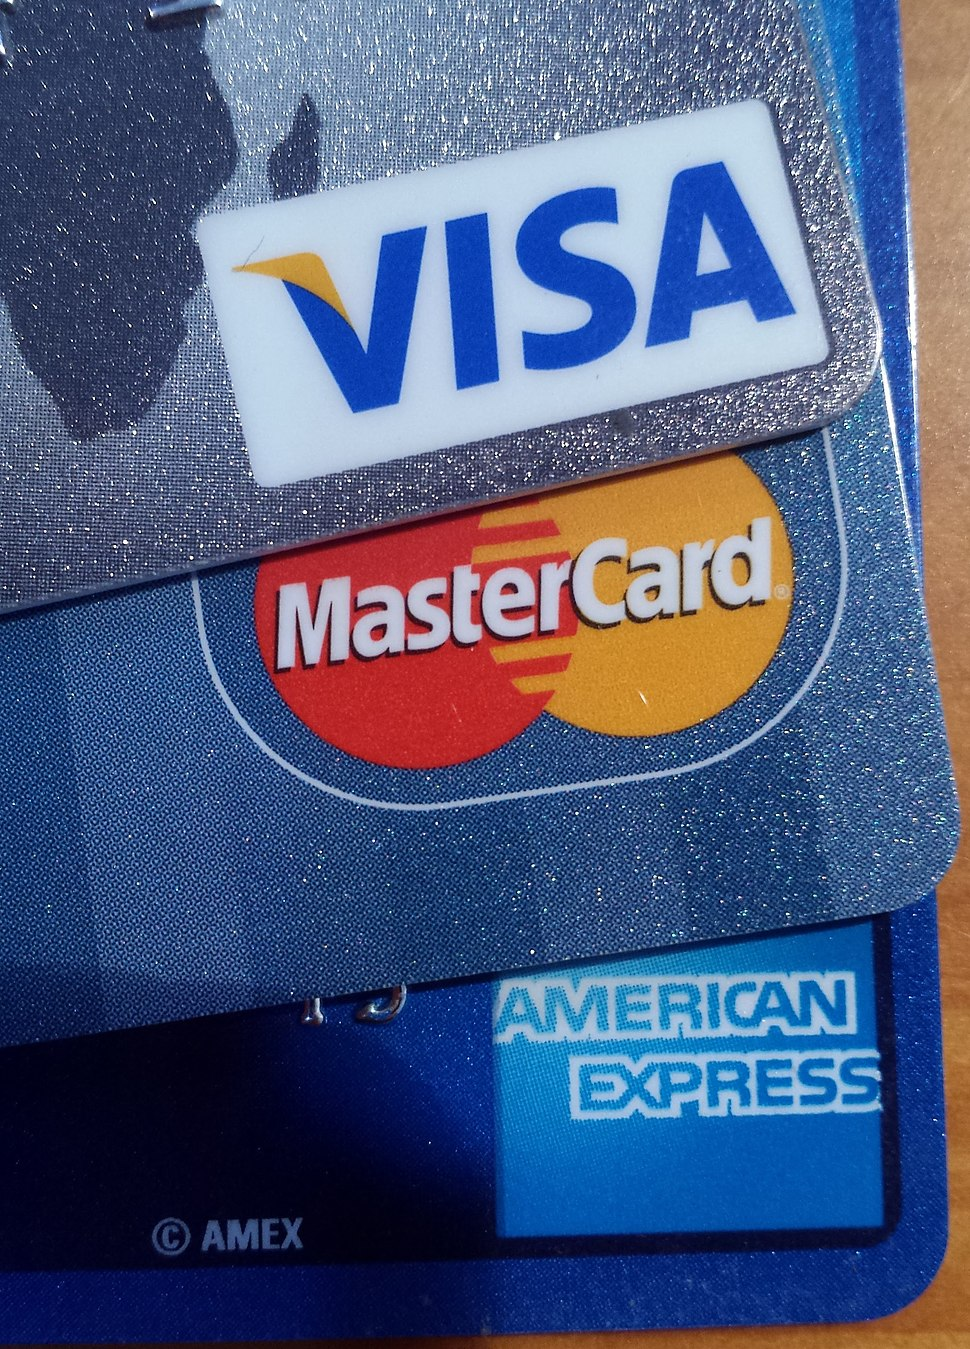 Credit card logos (2015-12-1816-27-350044)